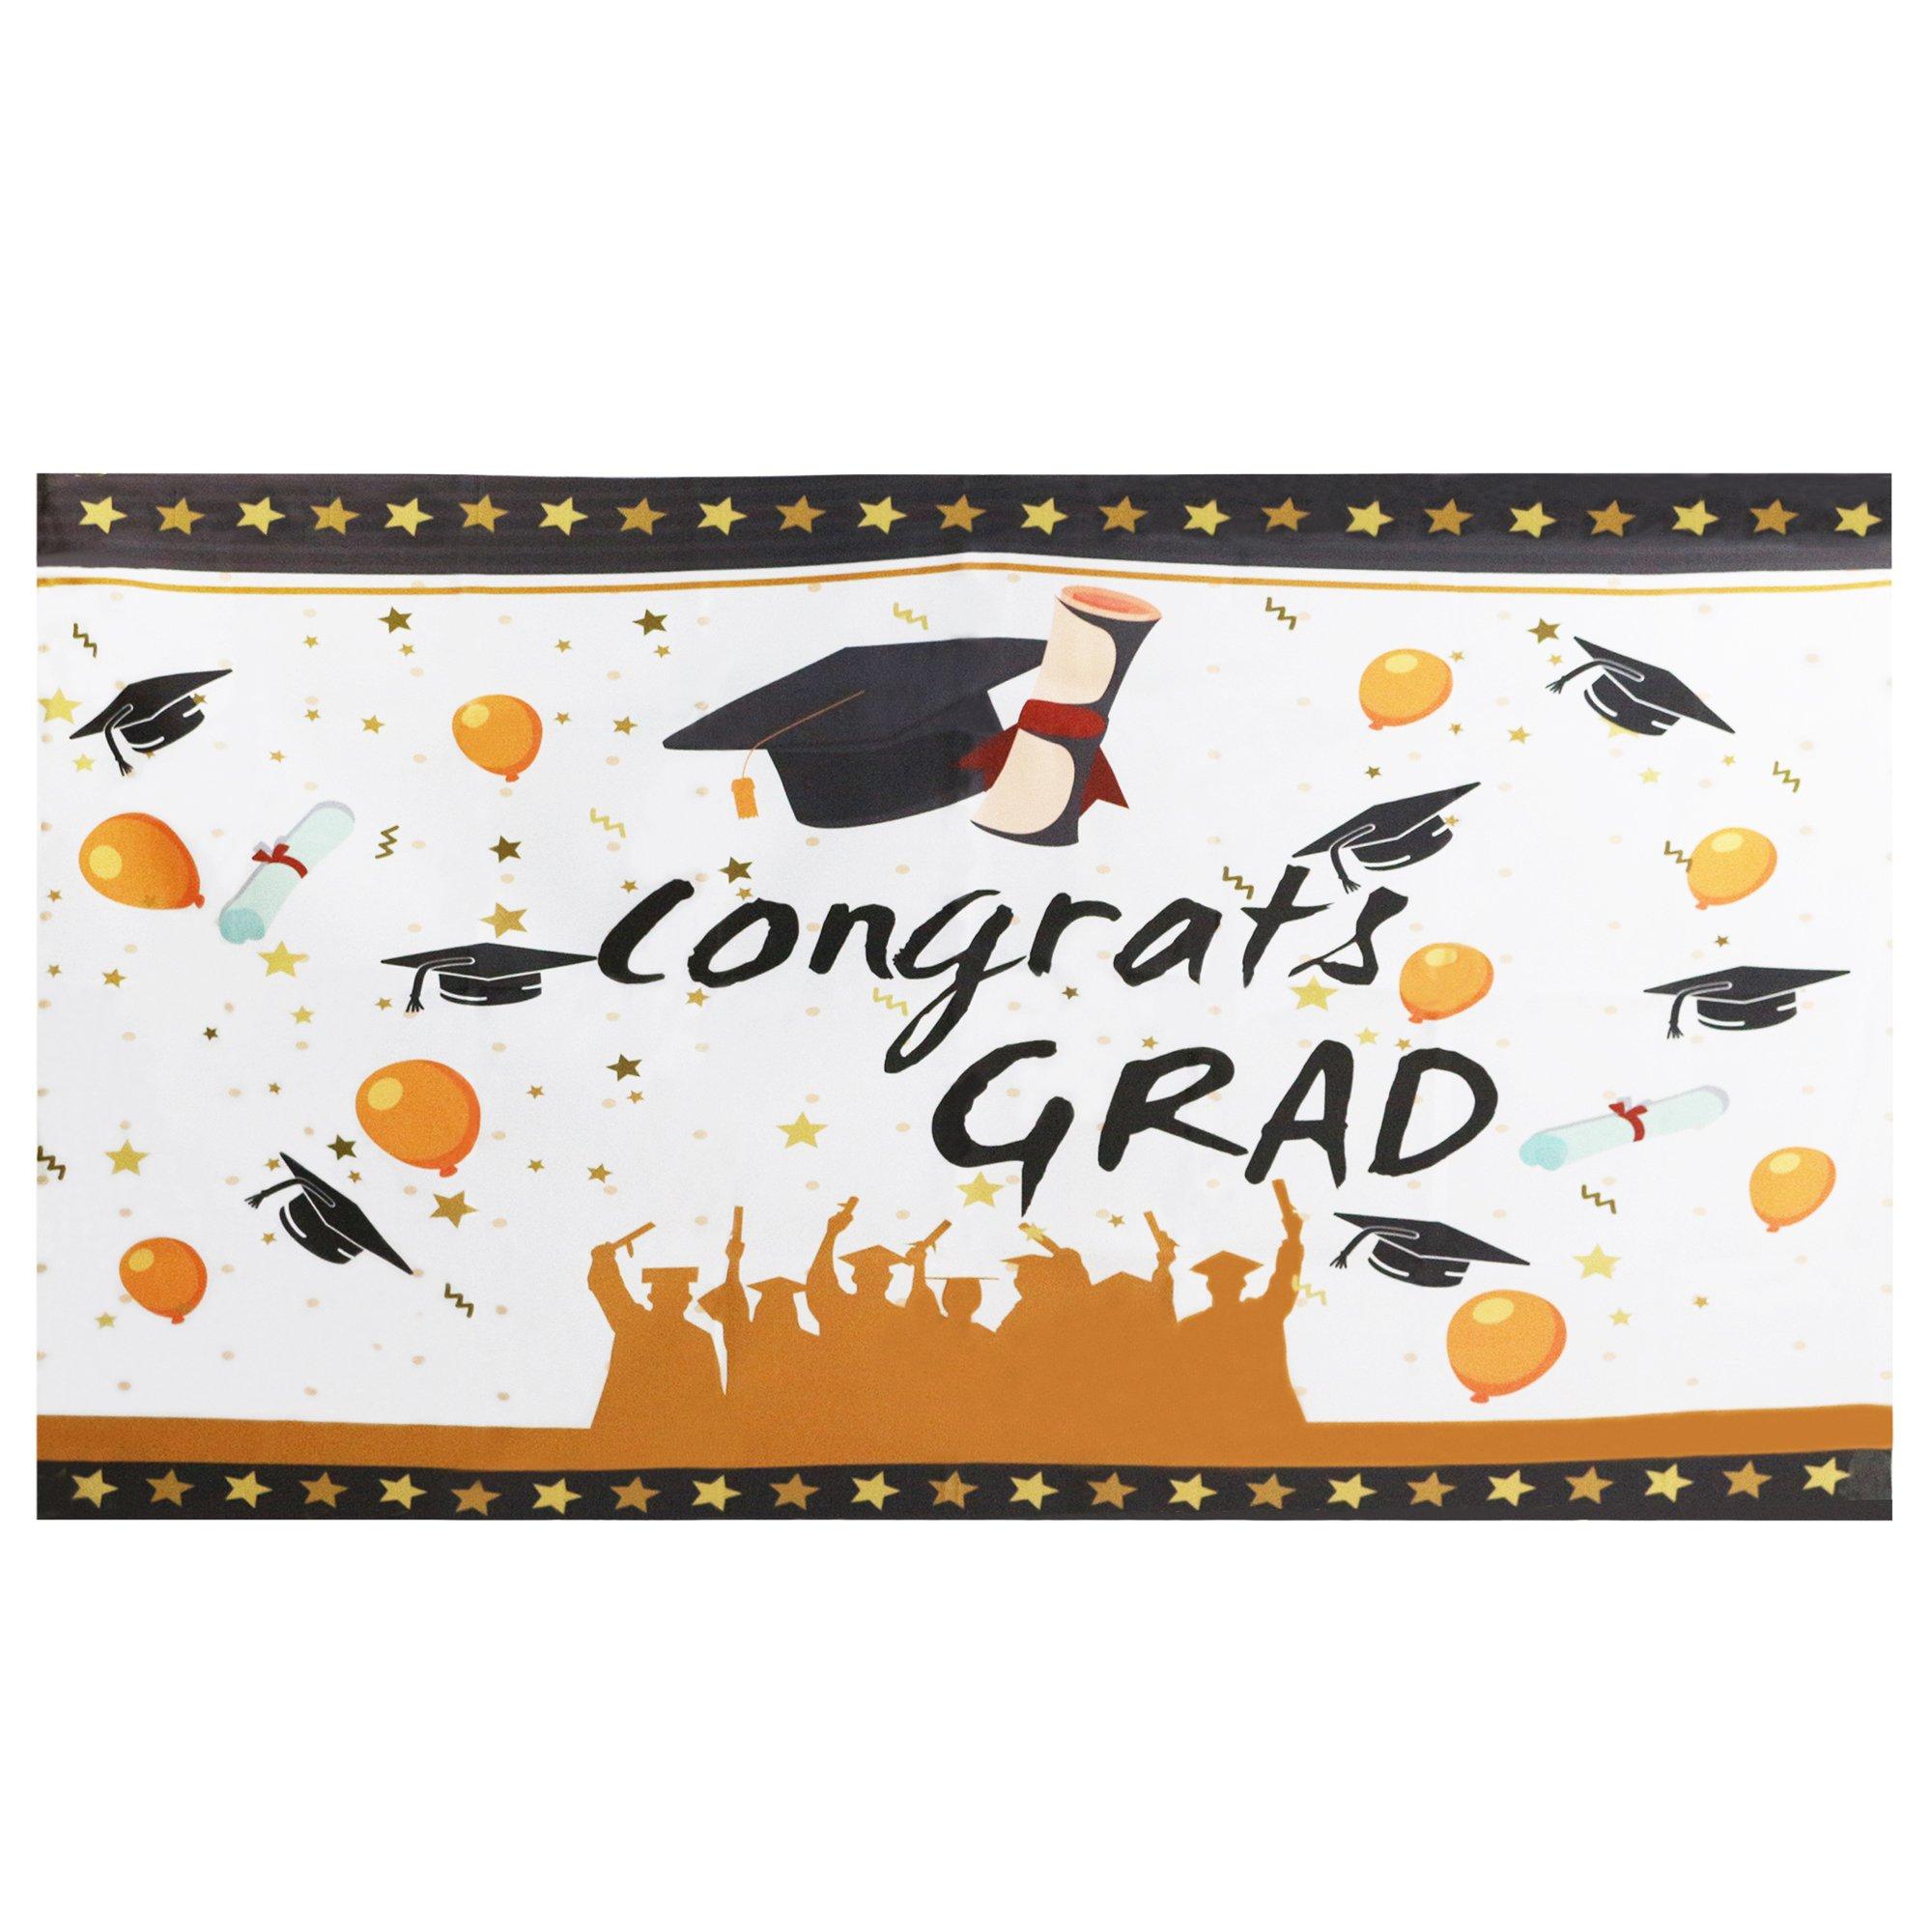 "Mosoan Large Graduation Banner | Graduation Party Decorations | Congrats Grad Banner Sign Supplies, 71"" x 40"" Size"